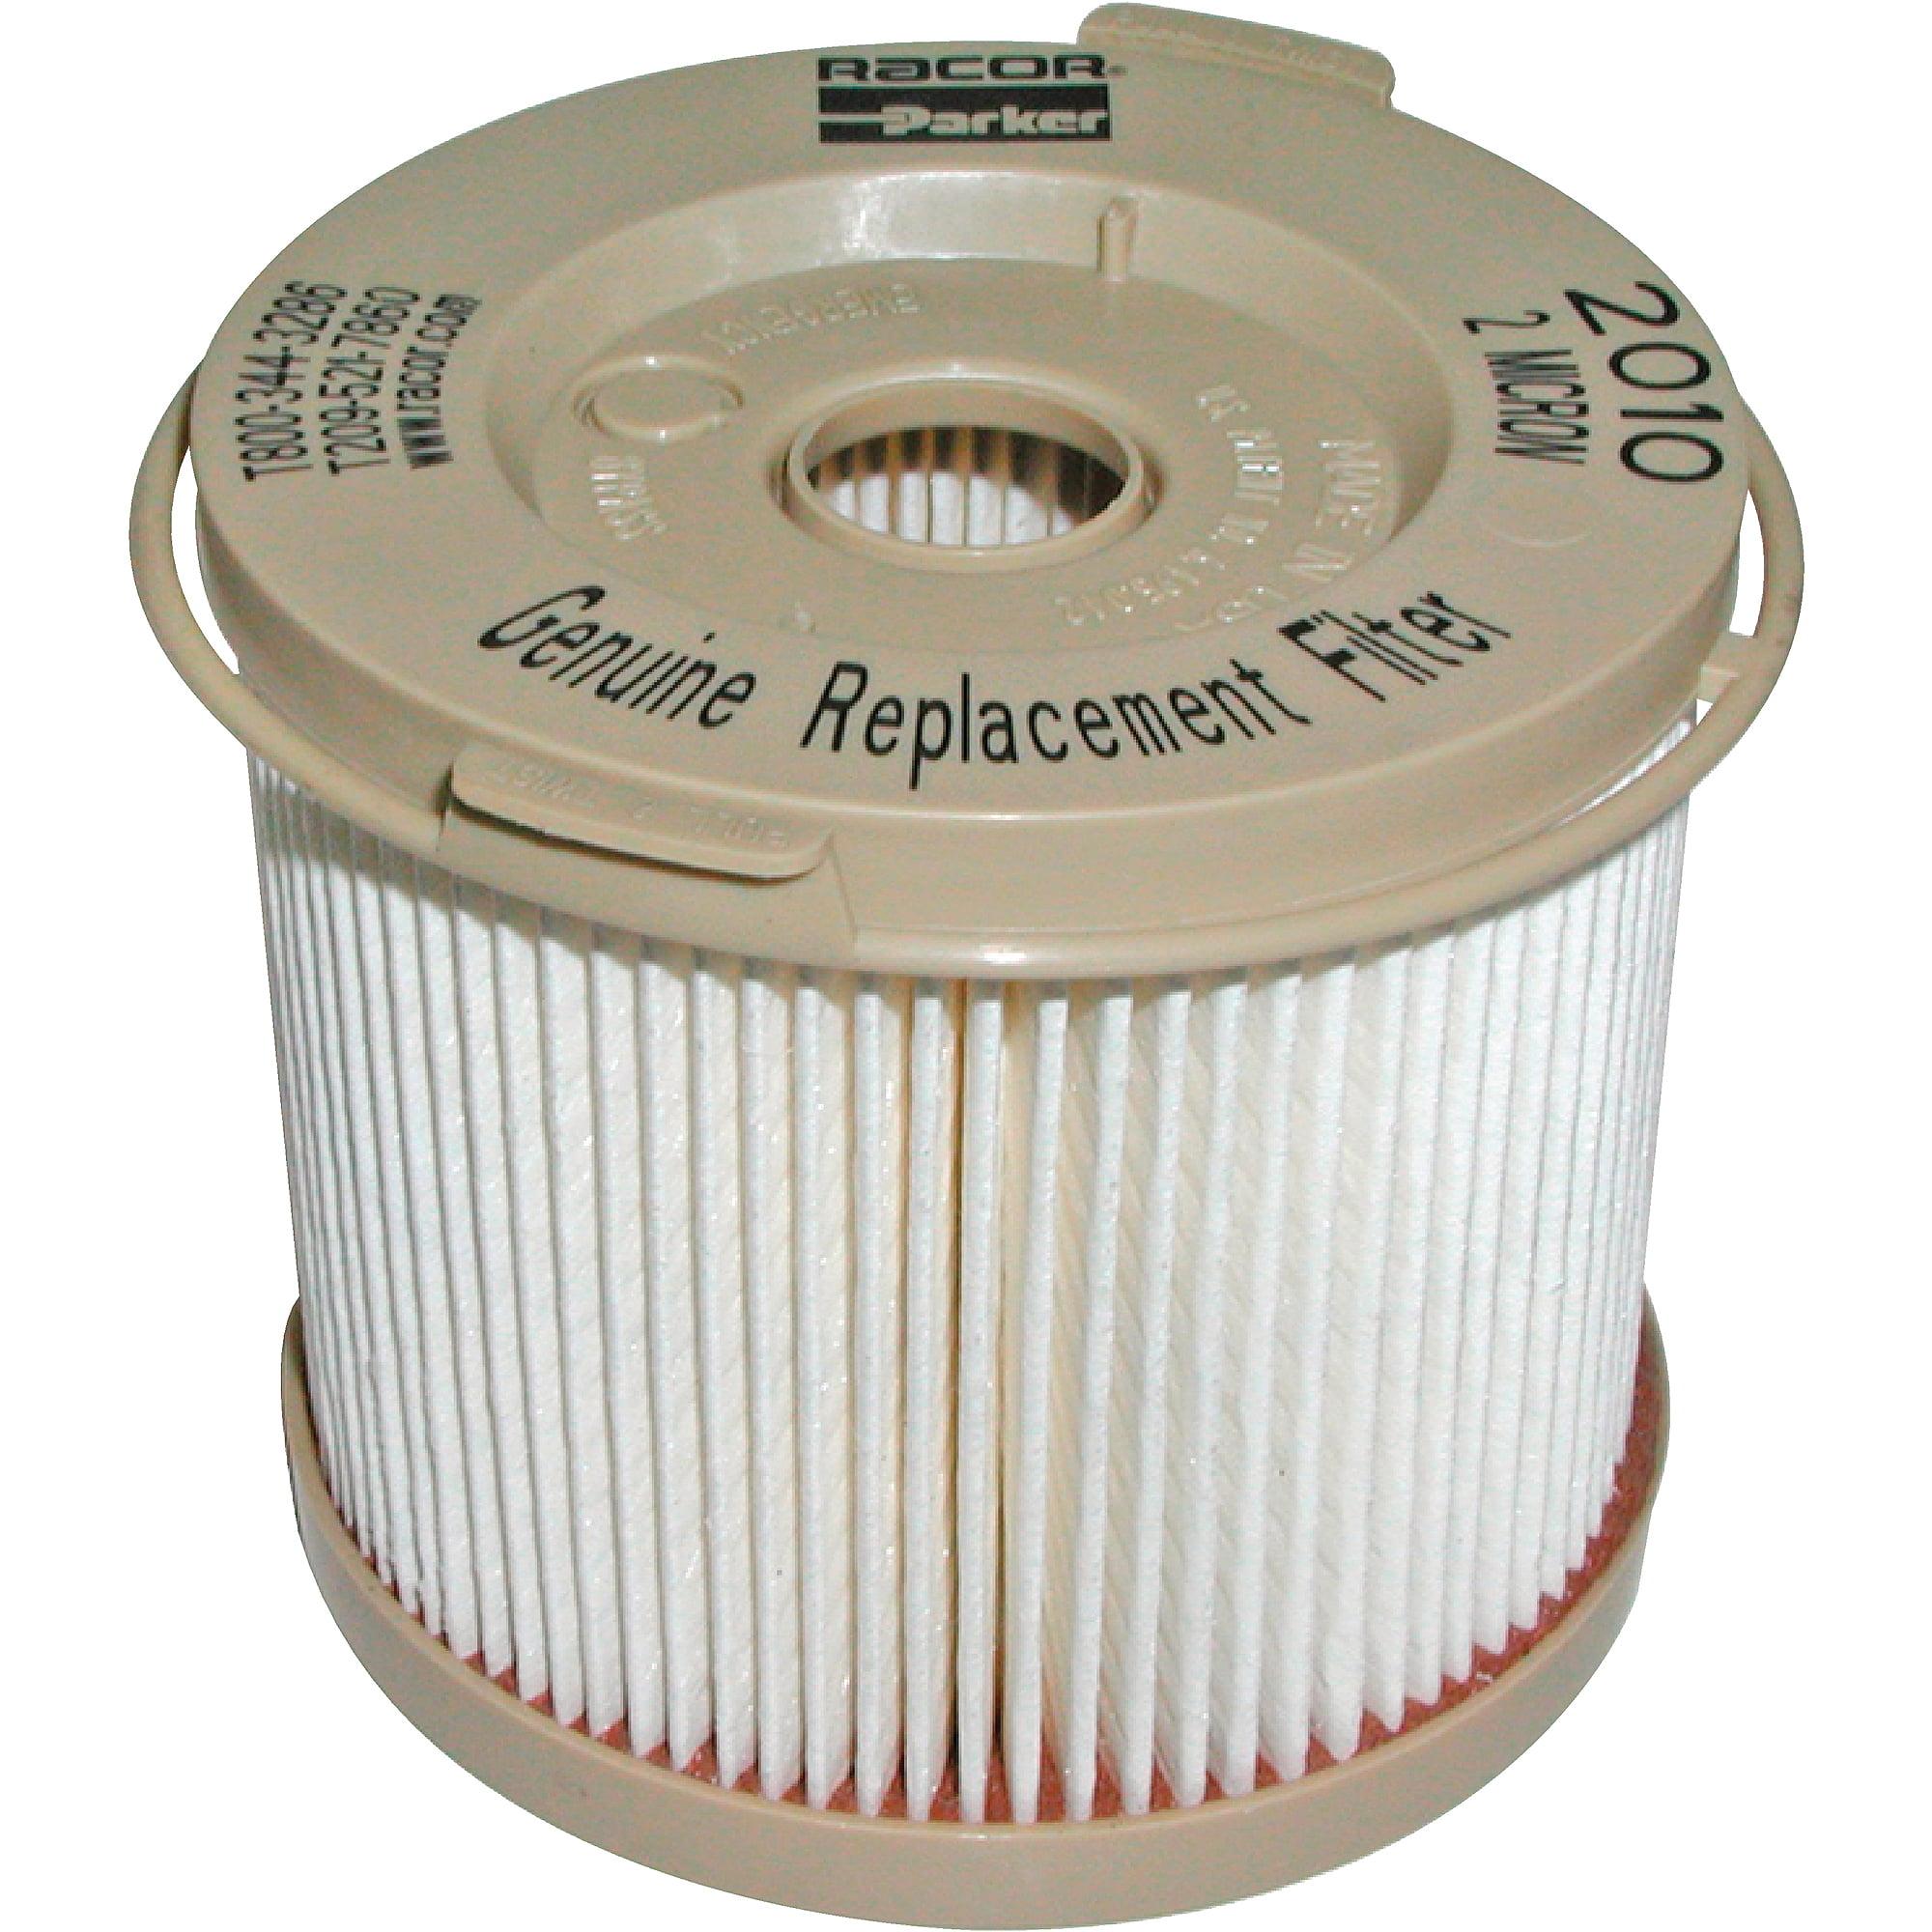 [FPER_4992]  Racor Replacement Element for Turbine Fuel Filter/Water Seperators -  Walmart.com - Walmart.com | Waterproof Fuel Filter |  | Walmart.com